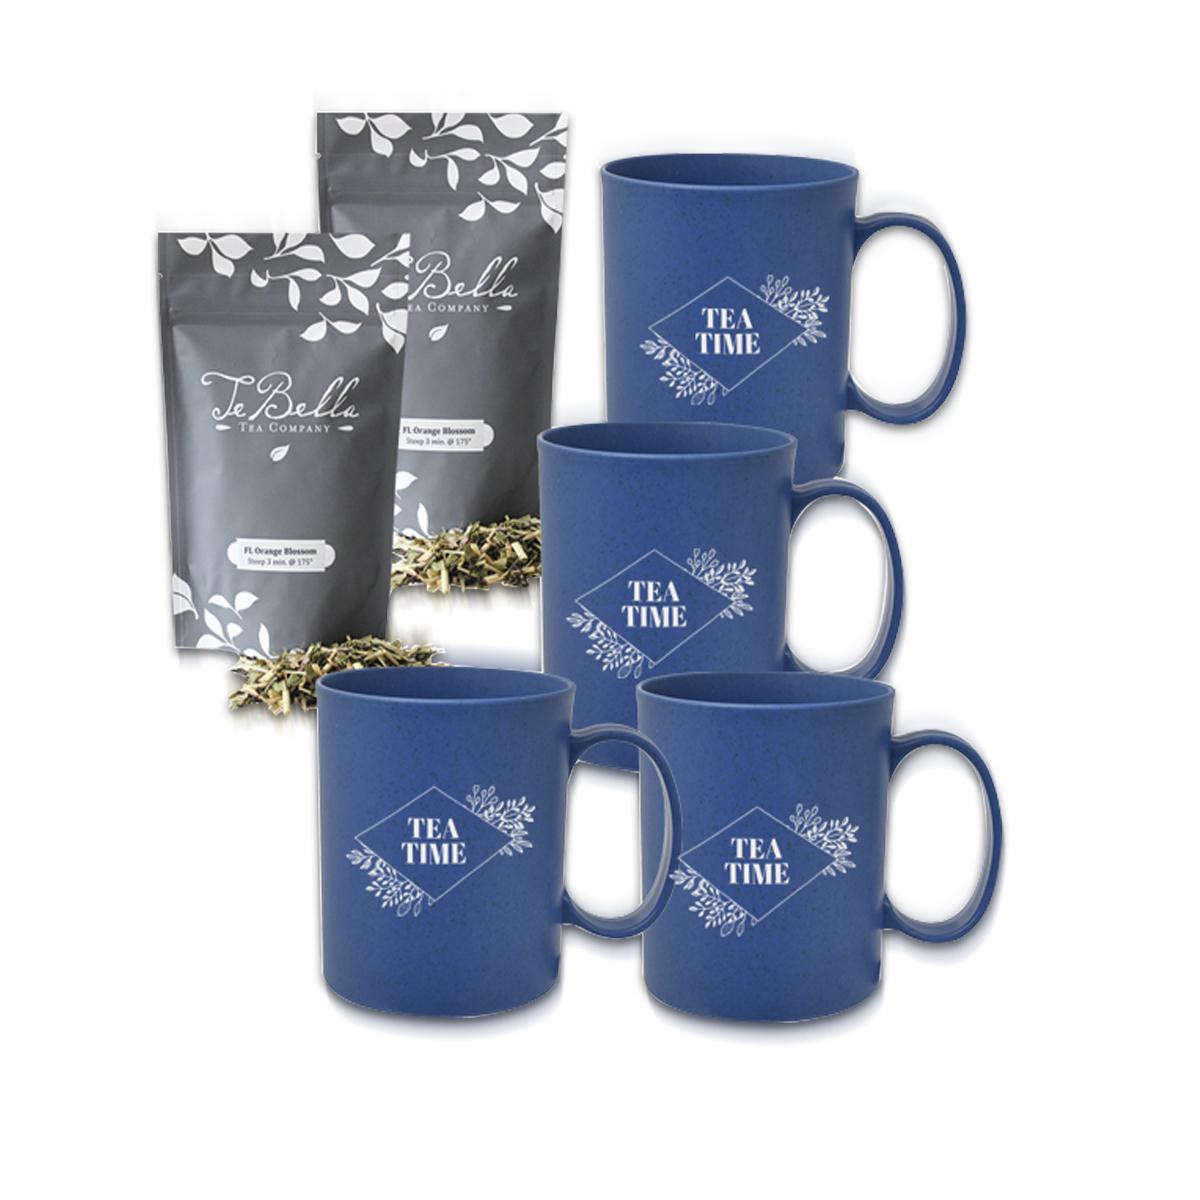 Custom TeBella 4 Piece Mug and Tea Gift Set